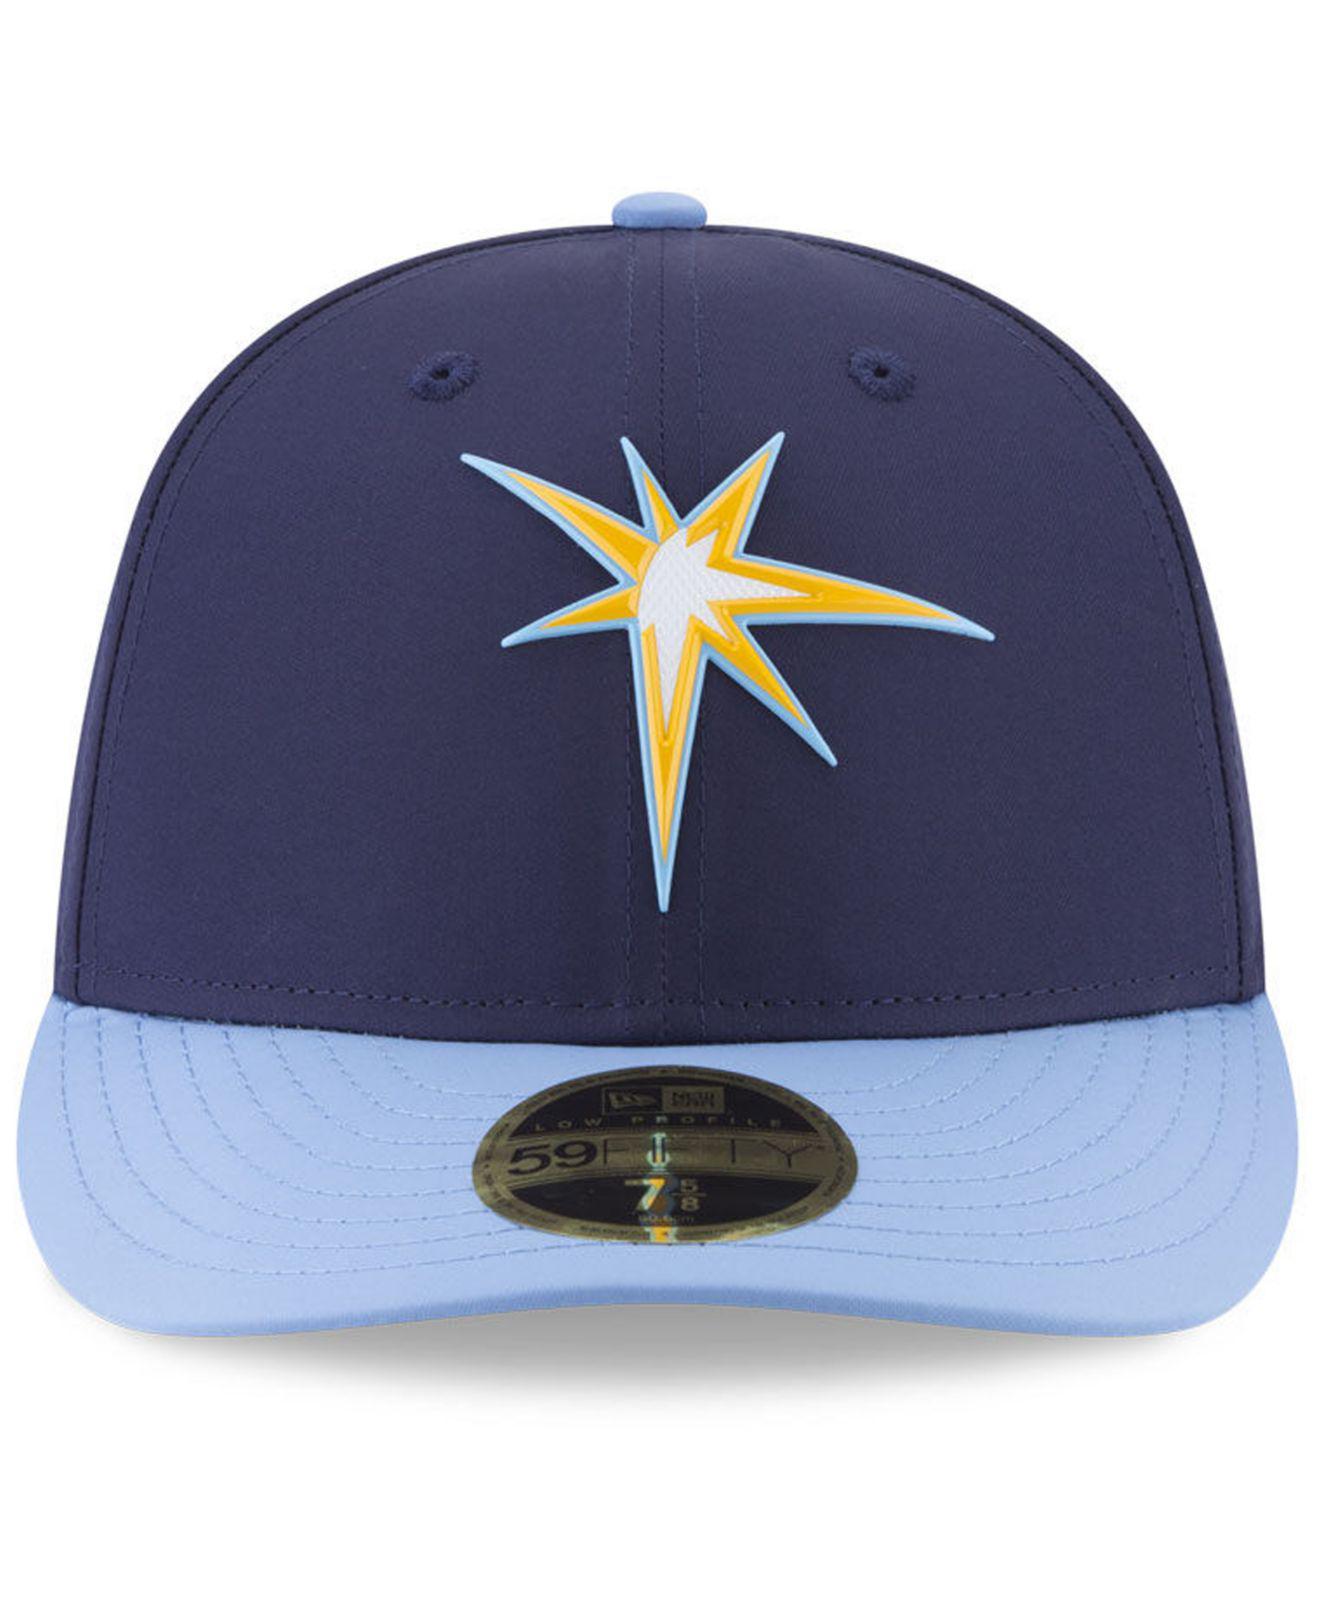 64bc5da9 denmark tampa bay rays new era mlb white batting practice 39thirty ...